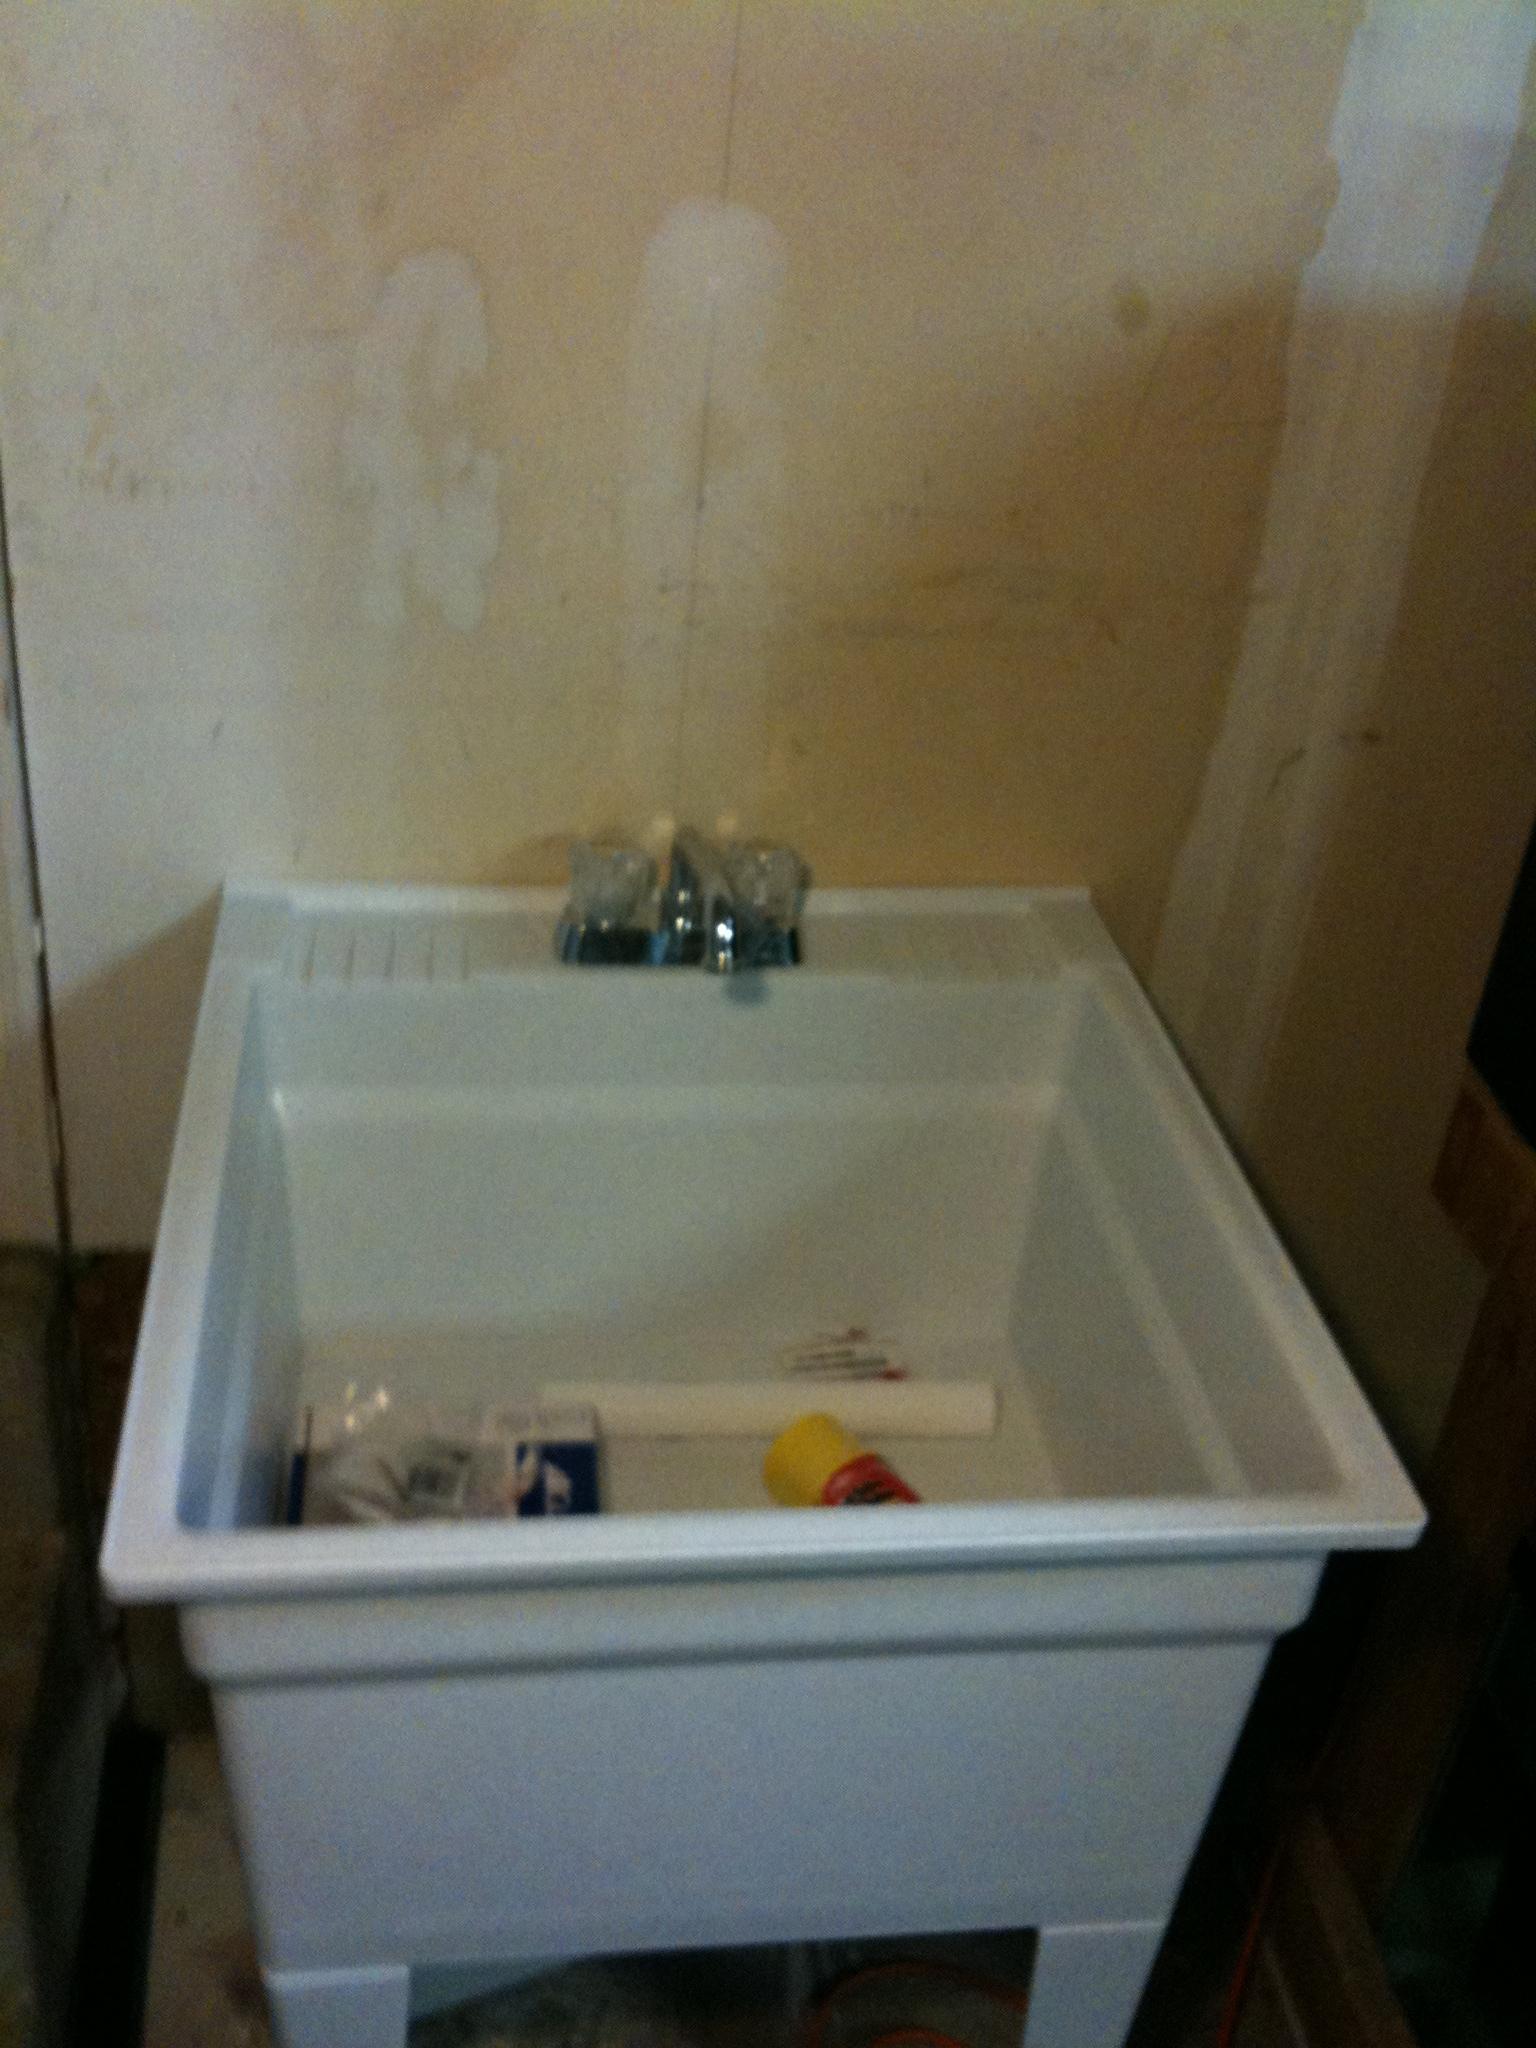 Utility Sink In Garage : Installing a Utility Sink in my Garage MonsterFishKeepers.com